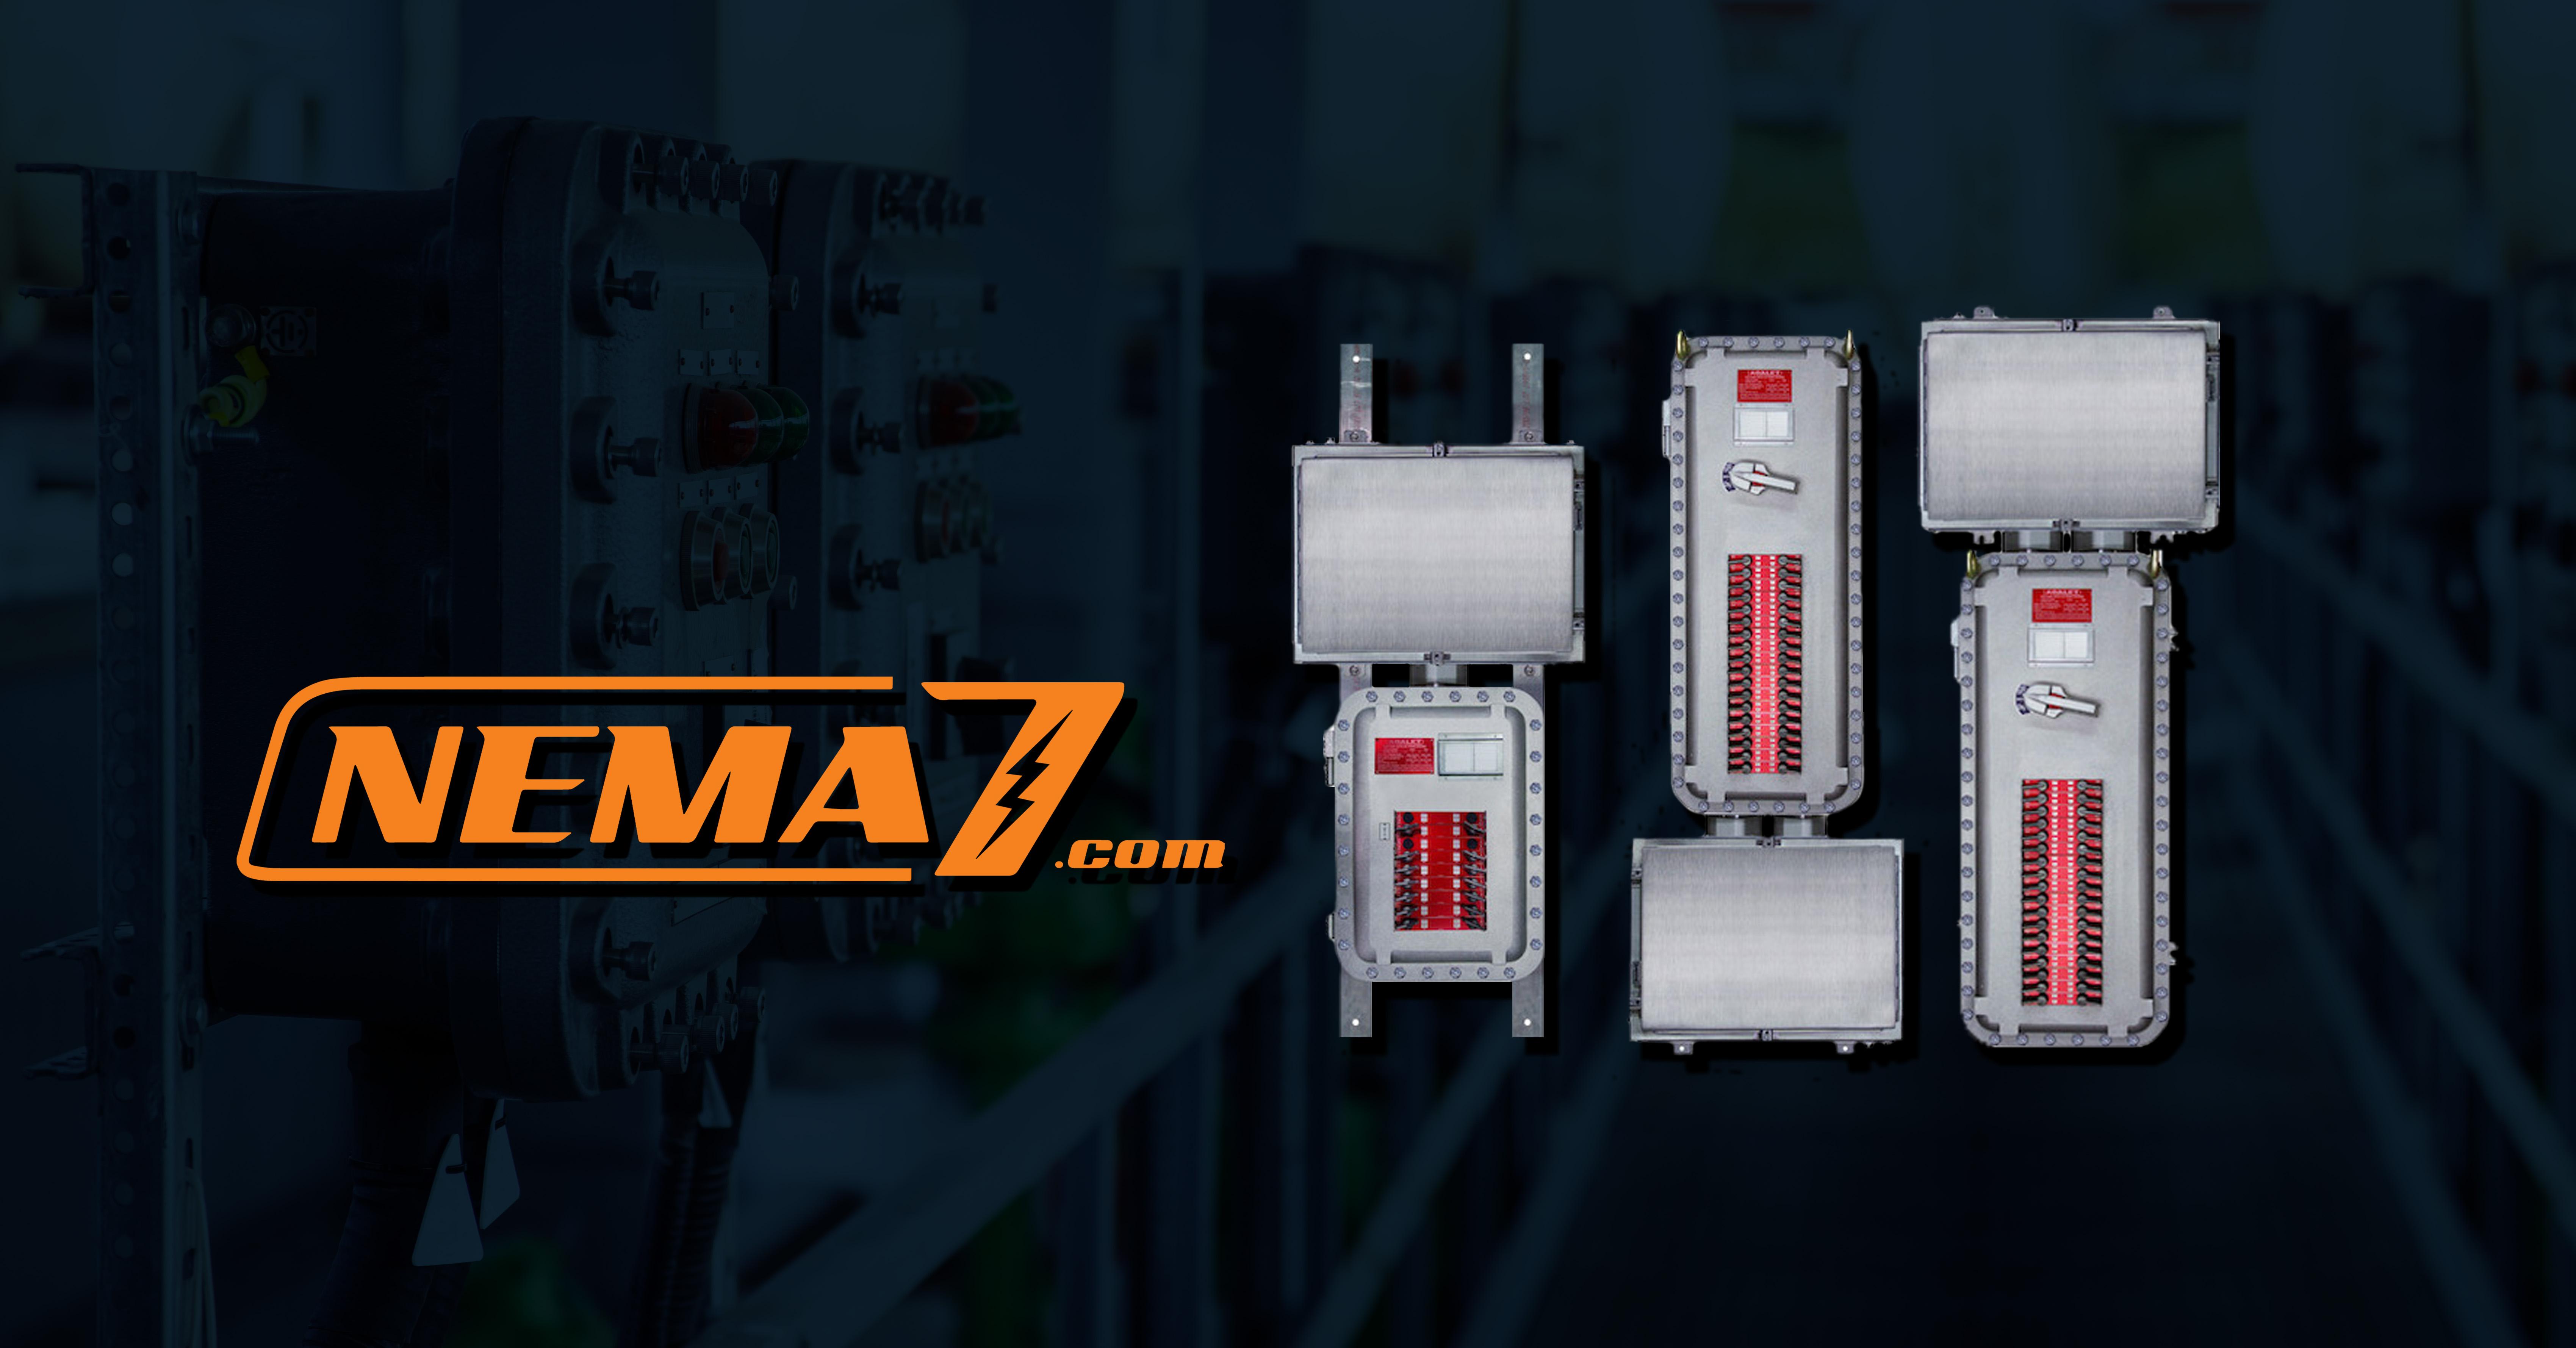 Factory-Sealed-Panelboards-Nema7